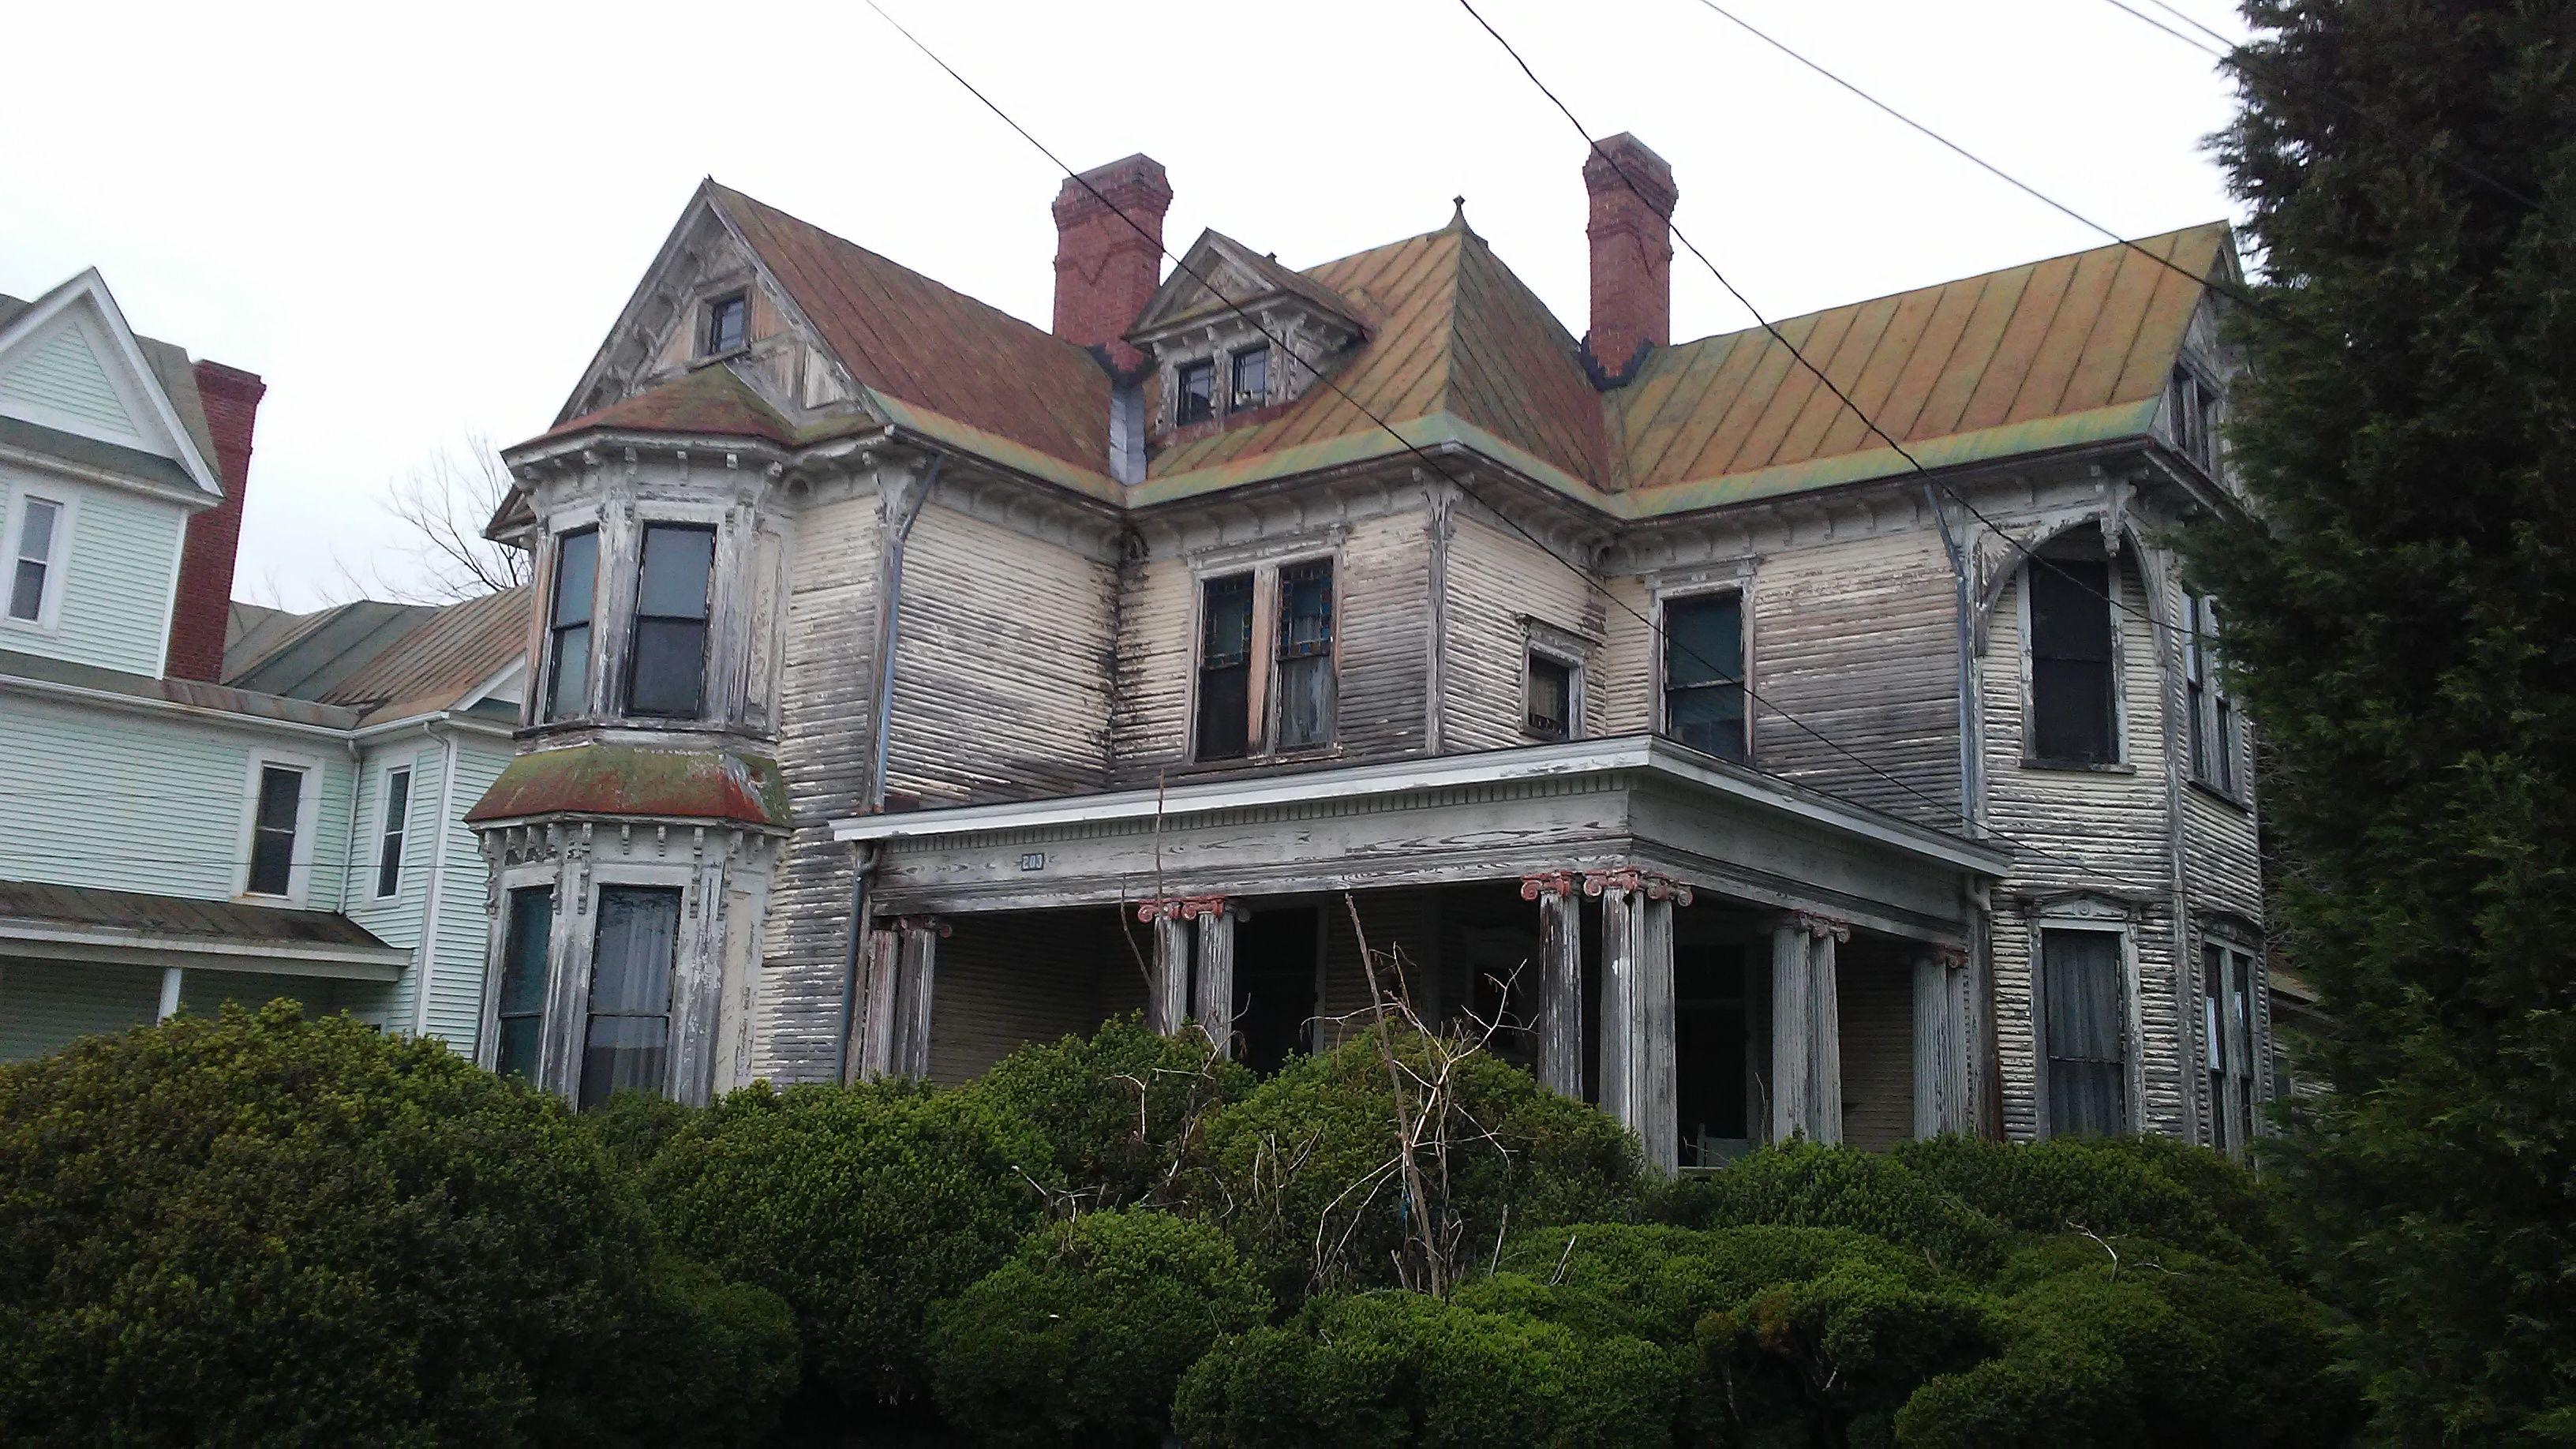 Union Street, Salem, Virginia | Eric Robert Nolan | House